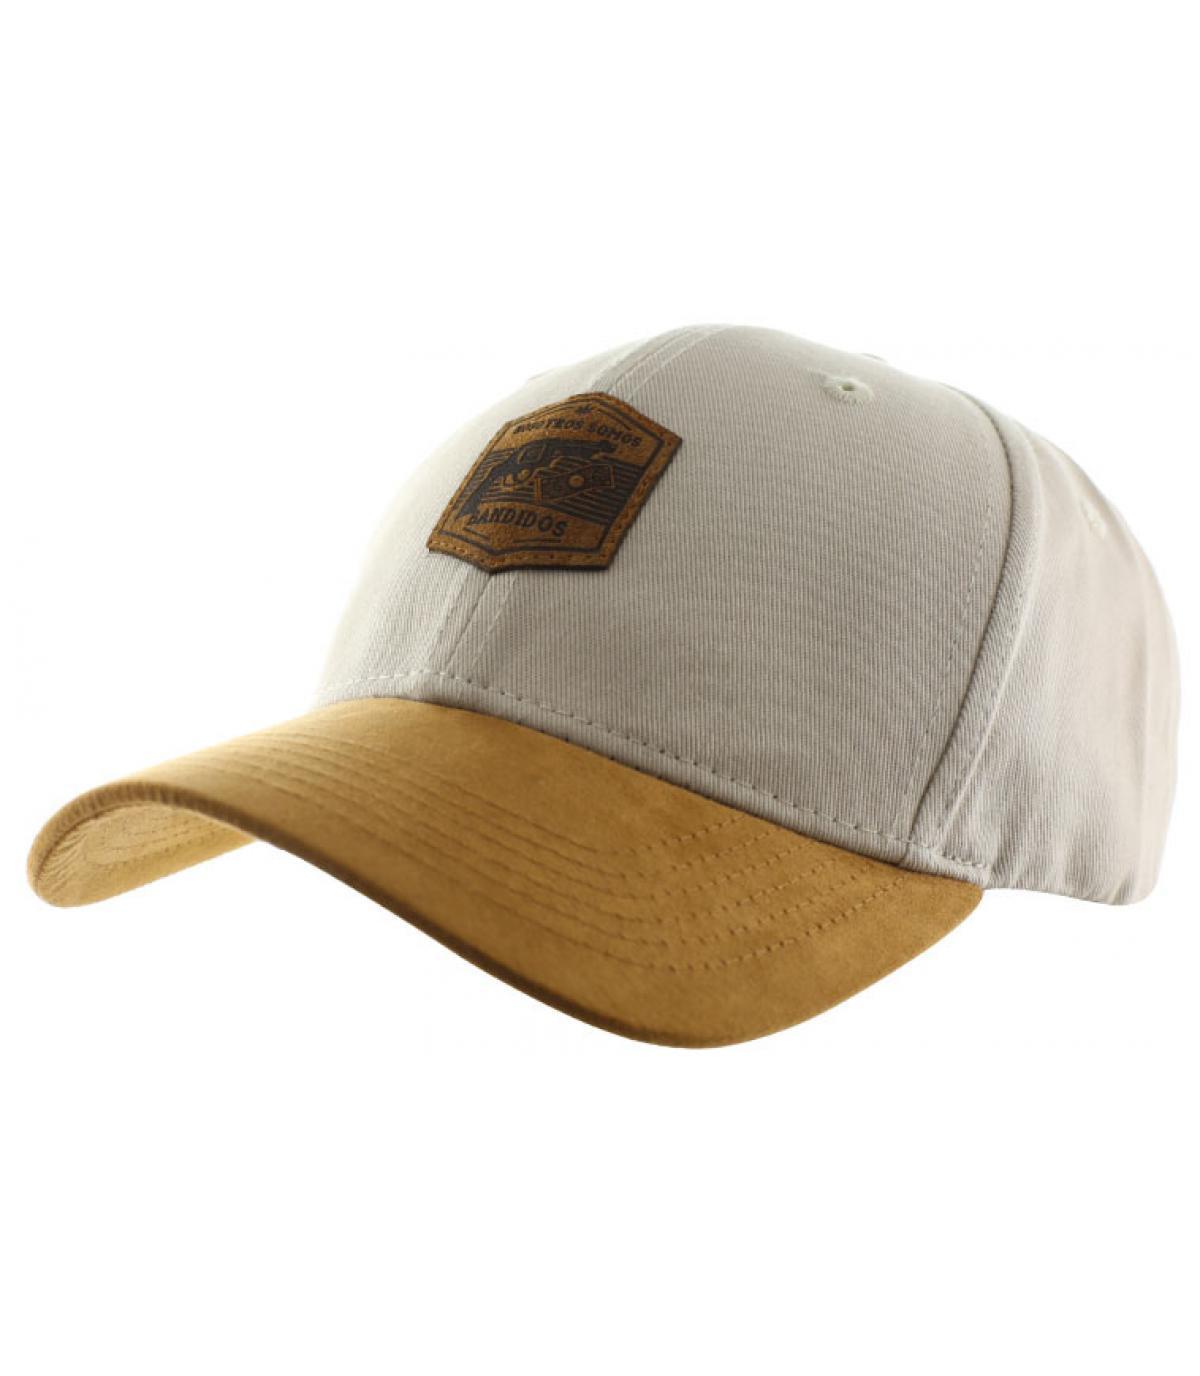 casquette Bandidos beige suède